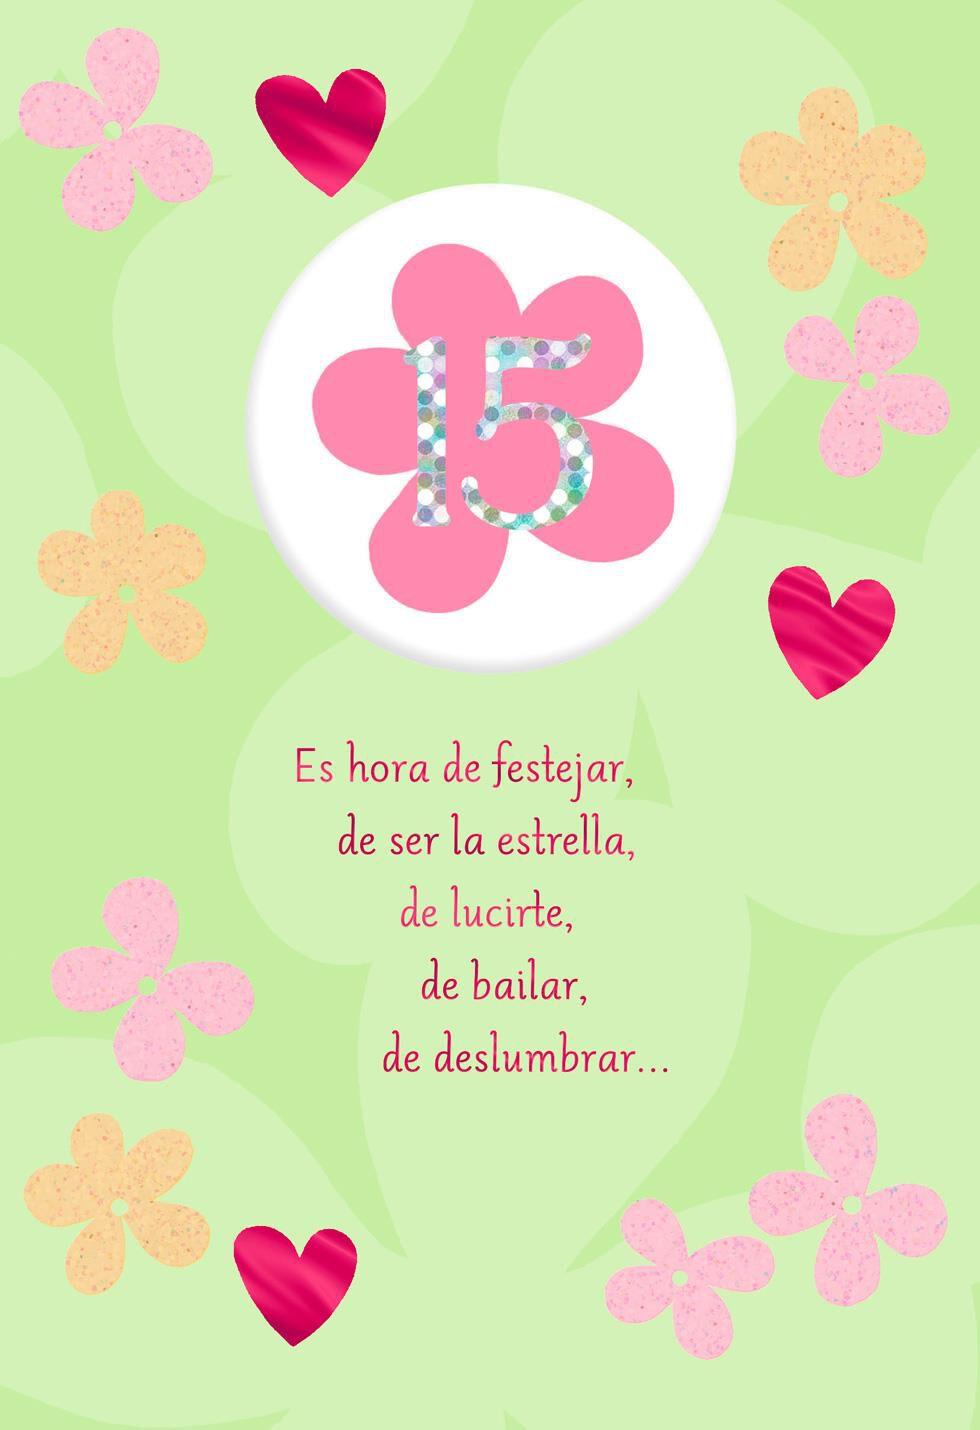 Happy Flowers SpanishLanguage 15th Birthday Card Greeting Cards – 15th Birthday Cards